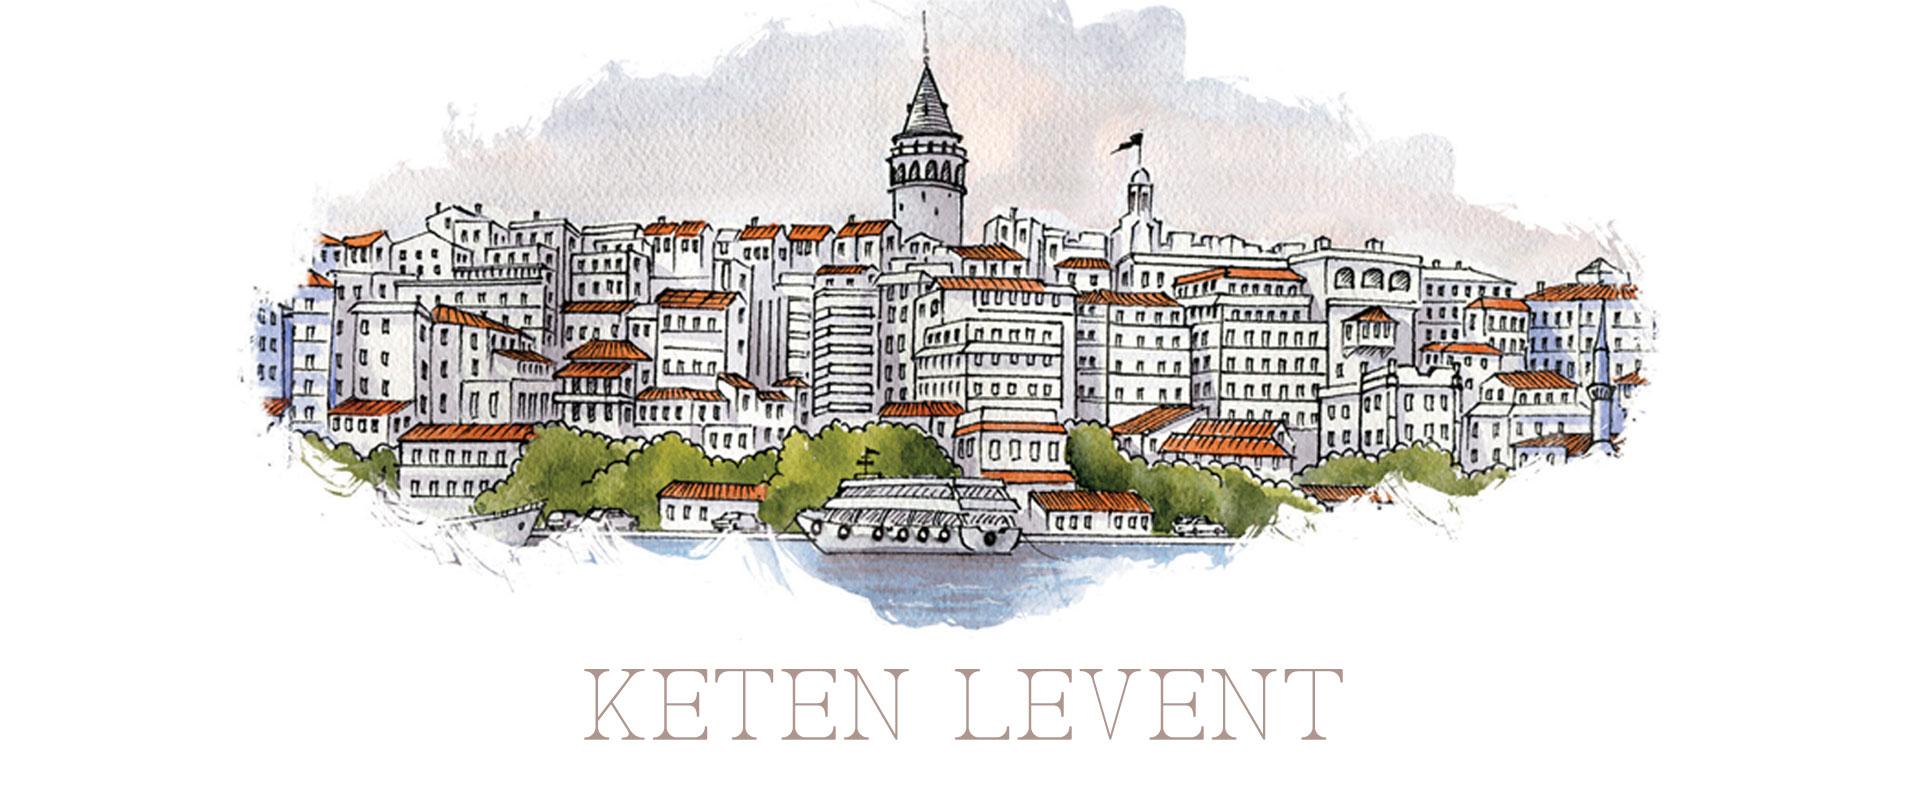 ket443_levent